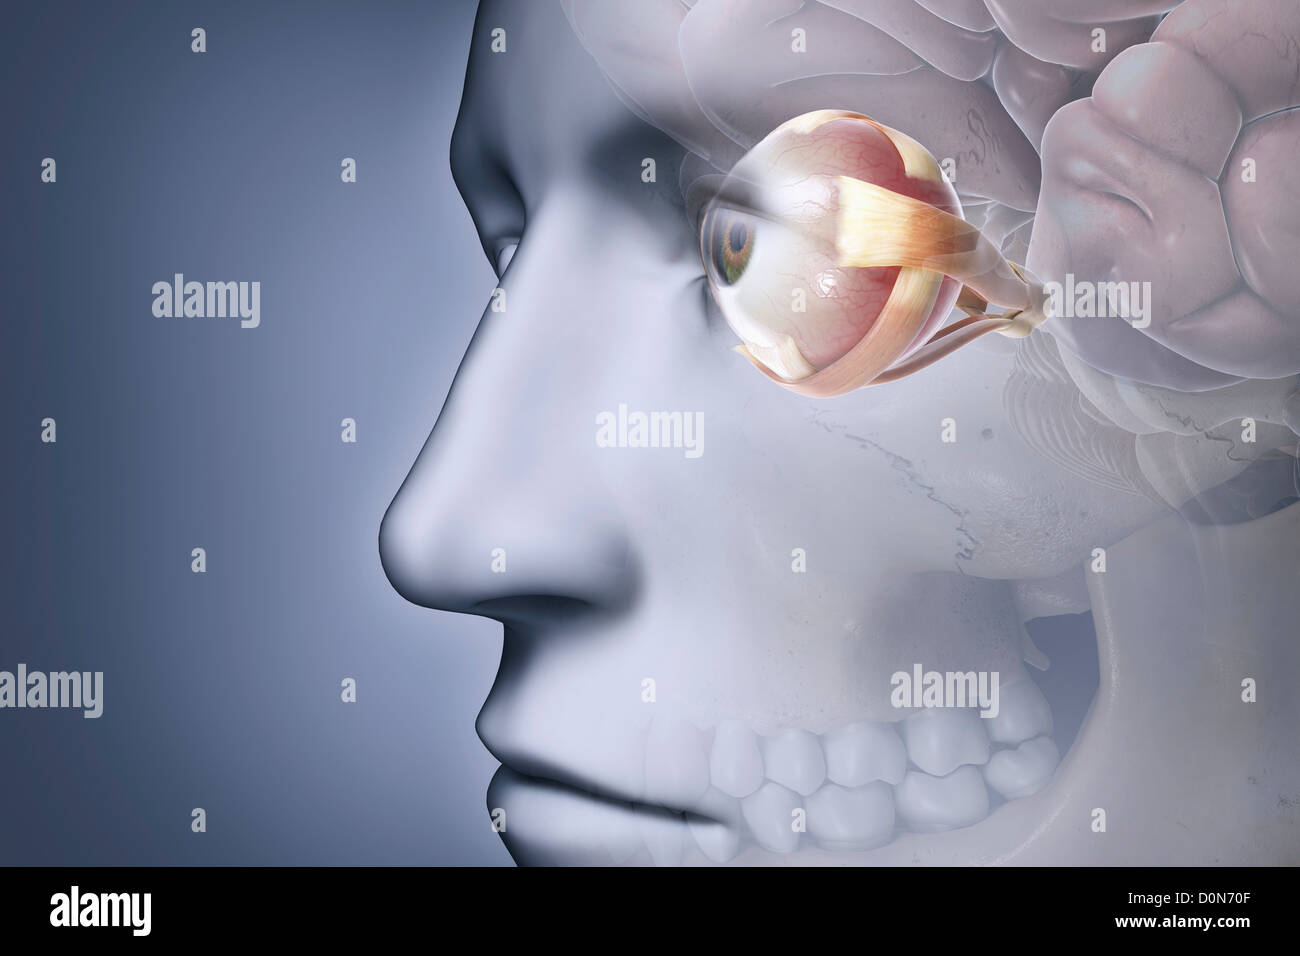 Anatomy Face Pupil Sclera Stockfotos & Anatomy Face Pupil Sclera ...